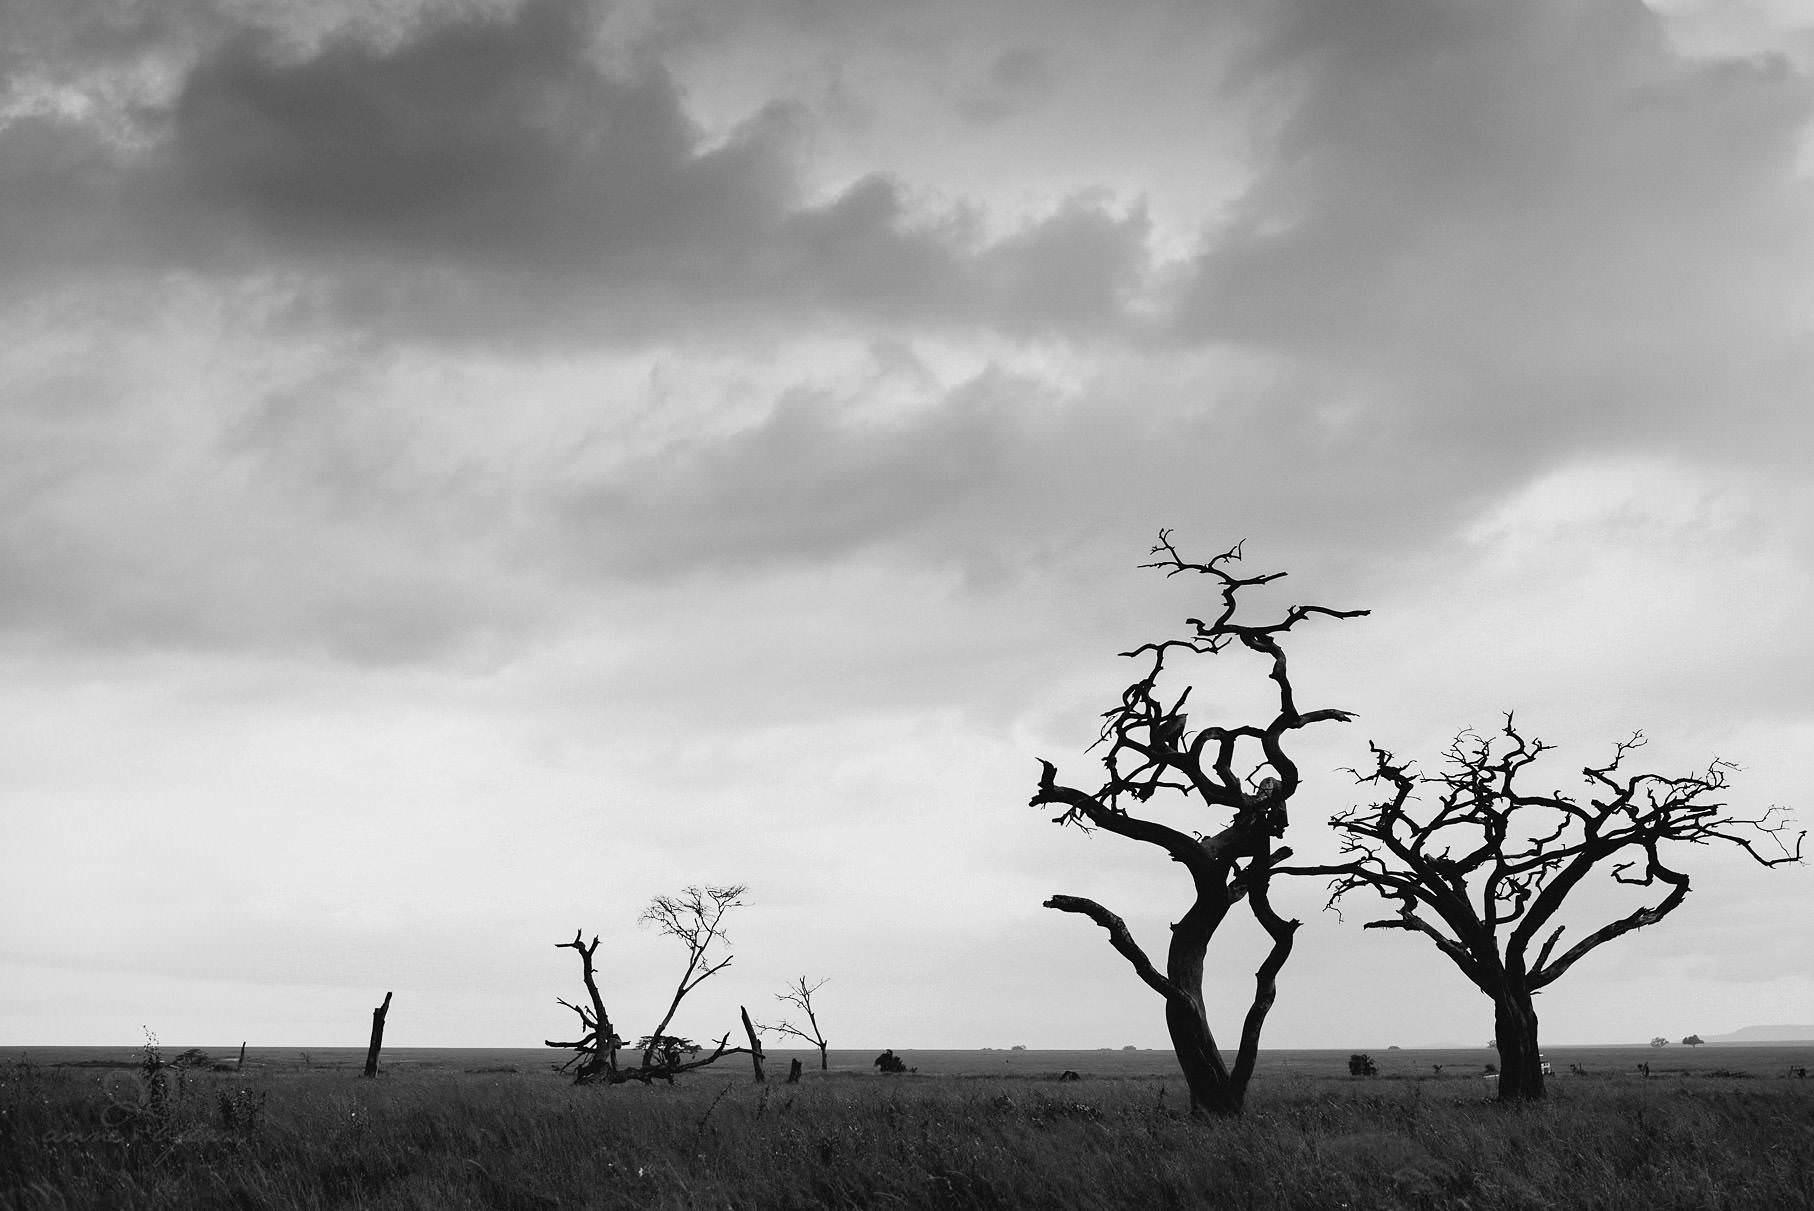 0037 tansania nd8 0329 anne bjoern fotografie hochzeitsfotograf hamburg - This is Tanzania - Serengeti, Kilimanjaro & Sansibar